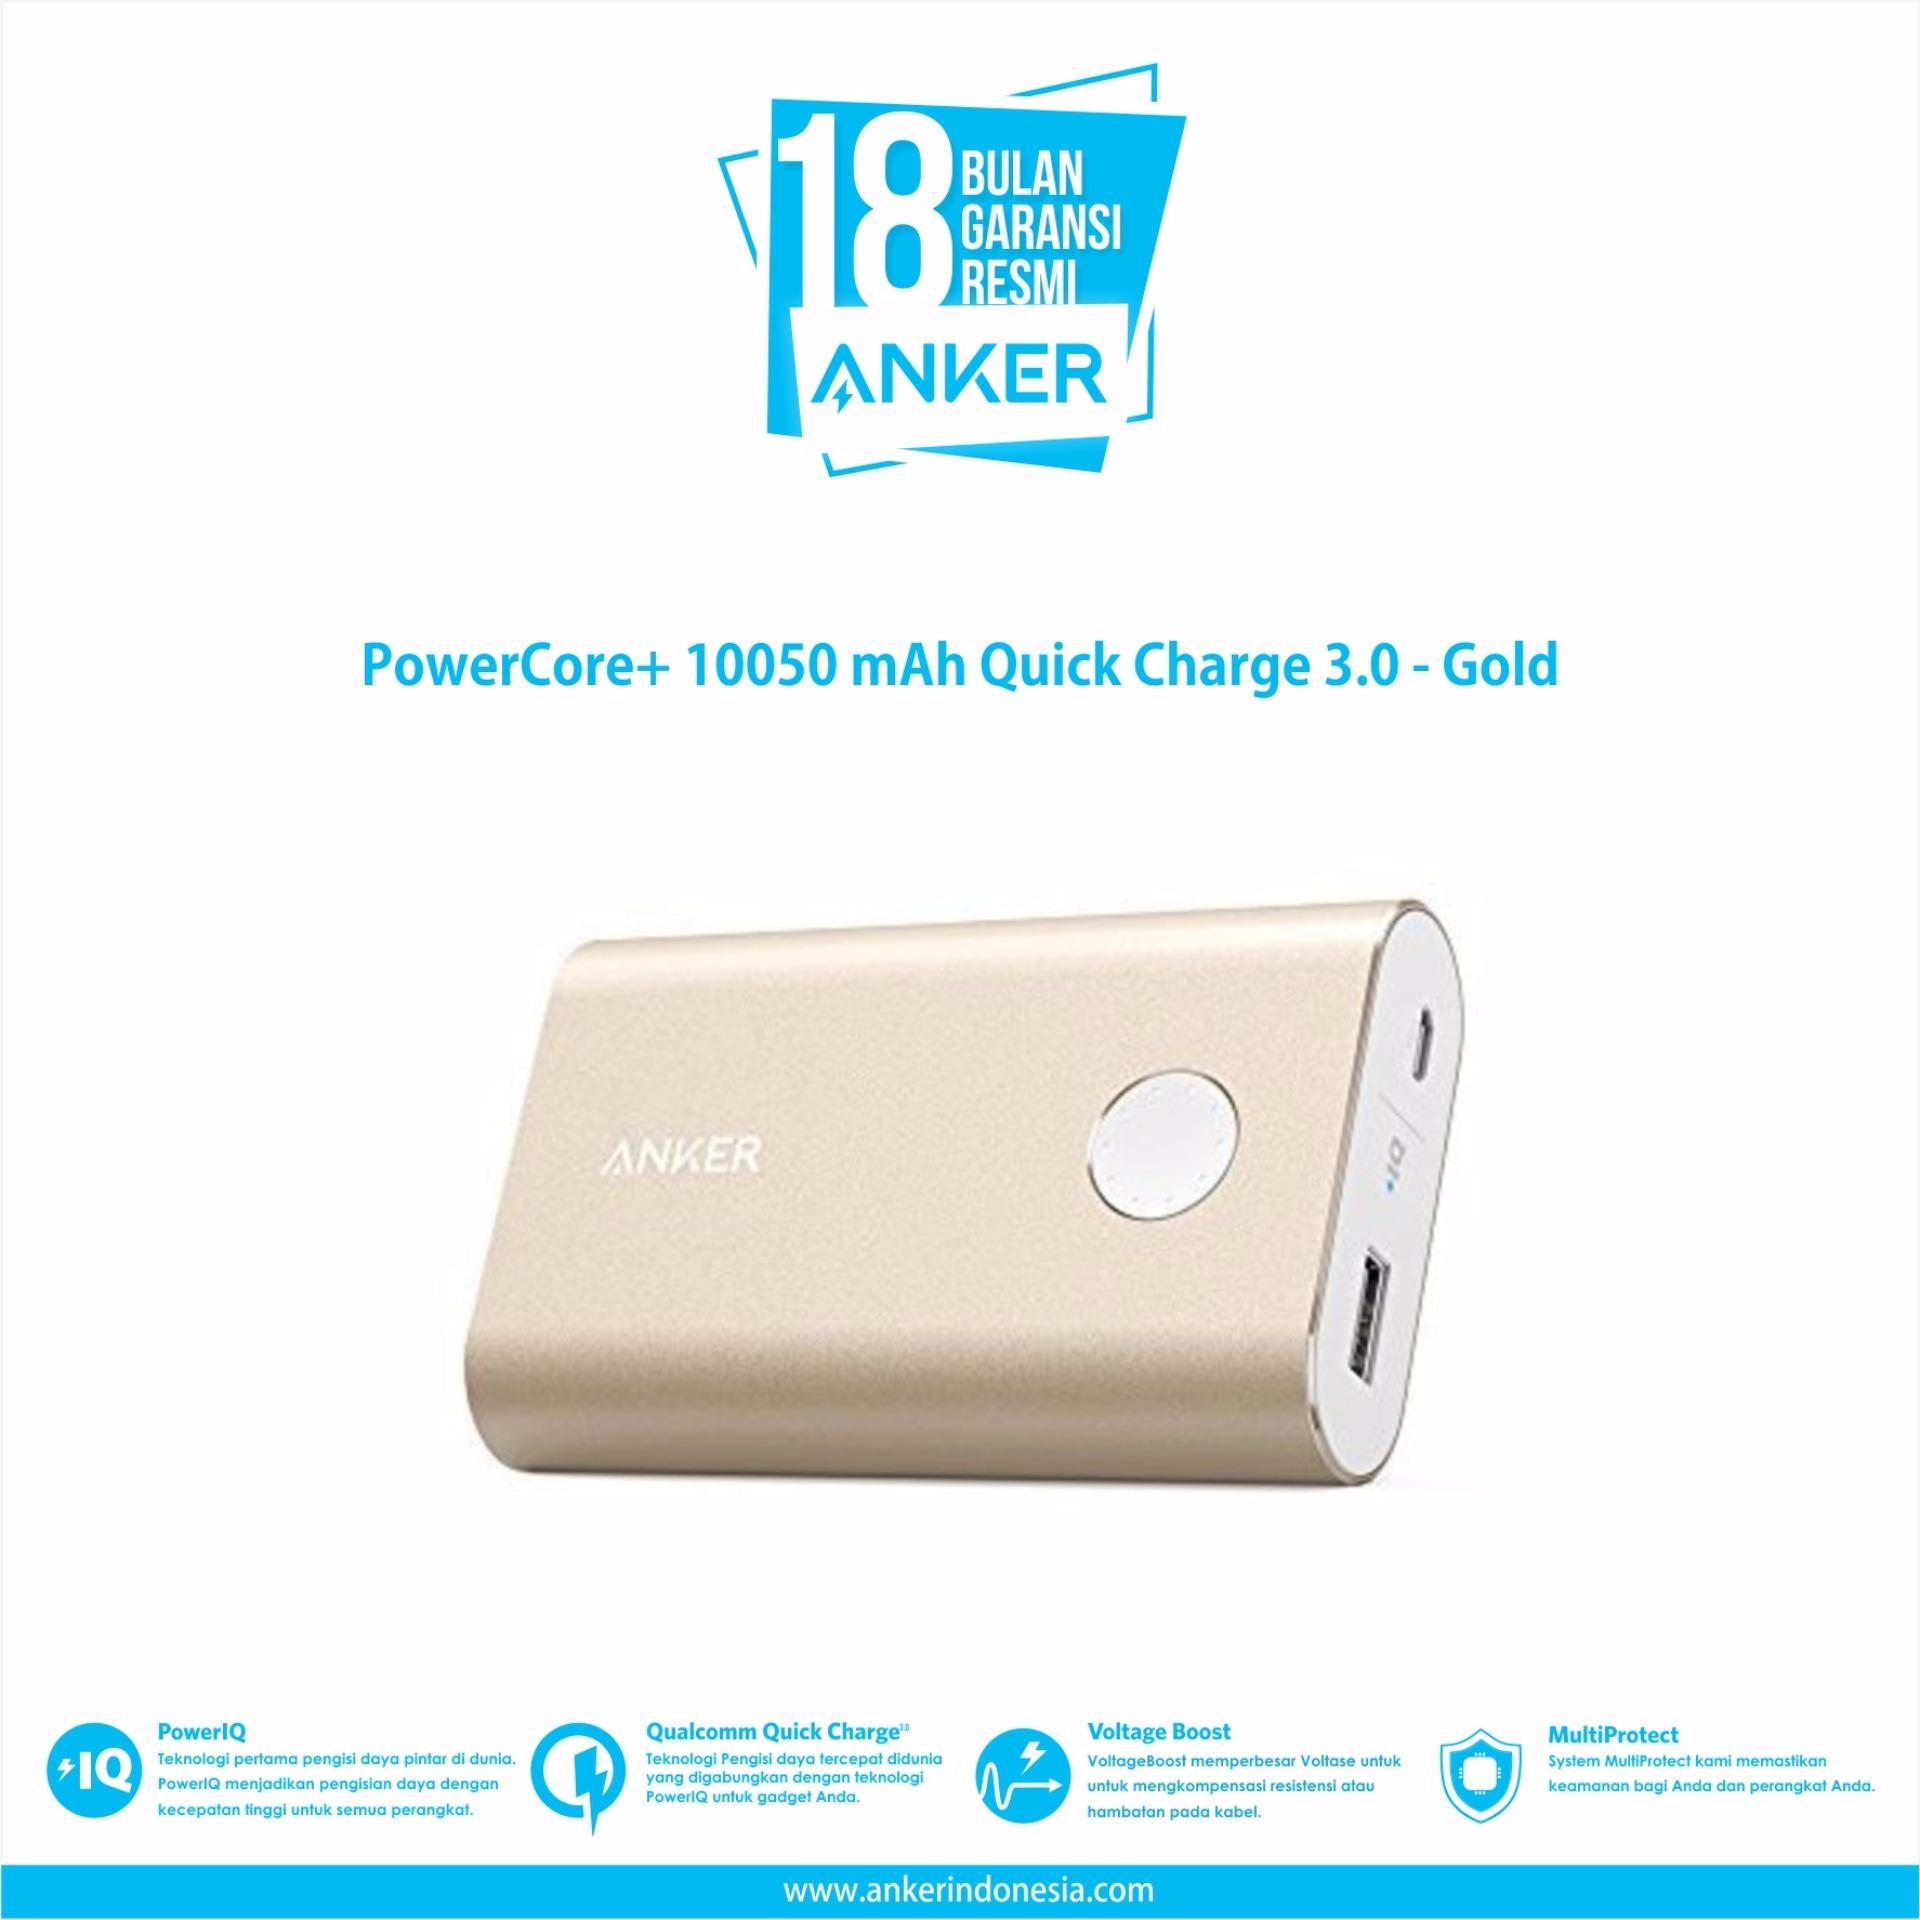 Beli Hippo Power Bank Hiro 6000mah Smartphone Acsesoris Uneed Powerbank 8000mah Qualcomm Quick Charge 30 Quickbox Dual Usb Port Real Capacity Original Didukung Oleh Teknologi Terkemuka Kami Powercore 10050 Mah Gold